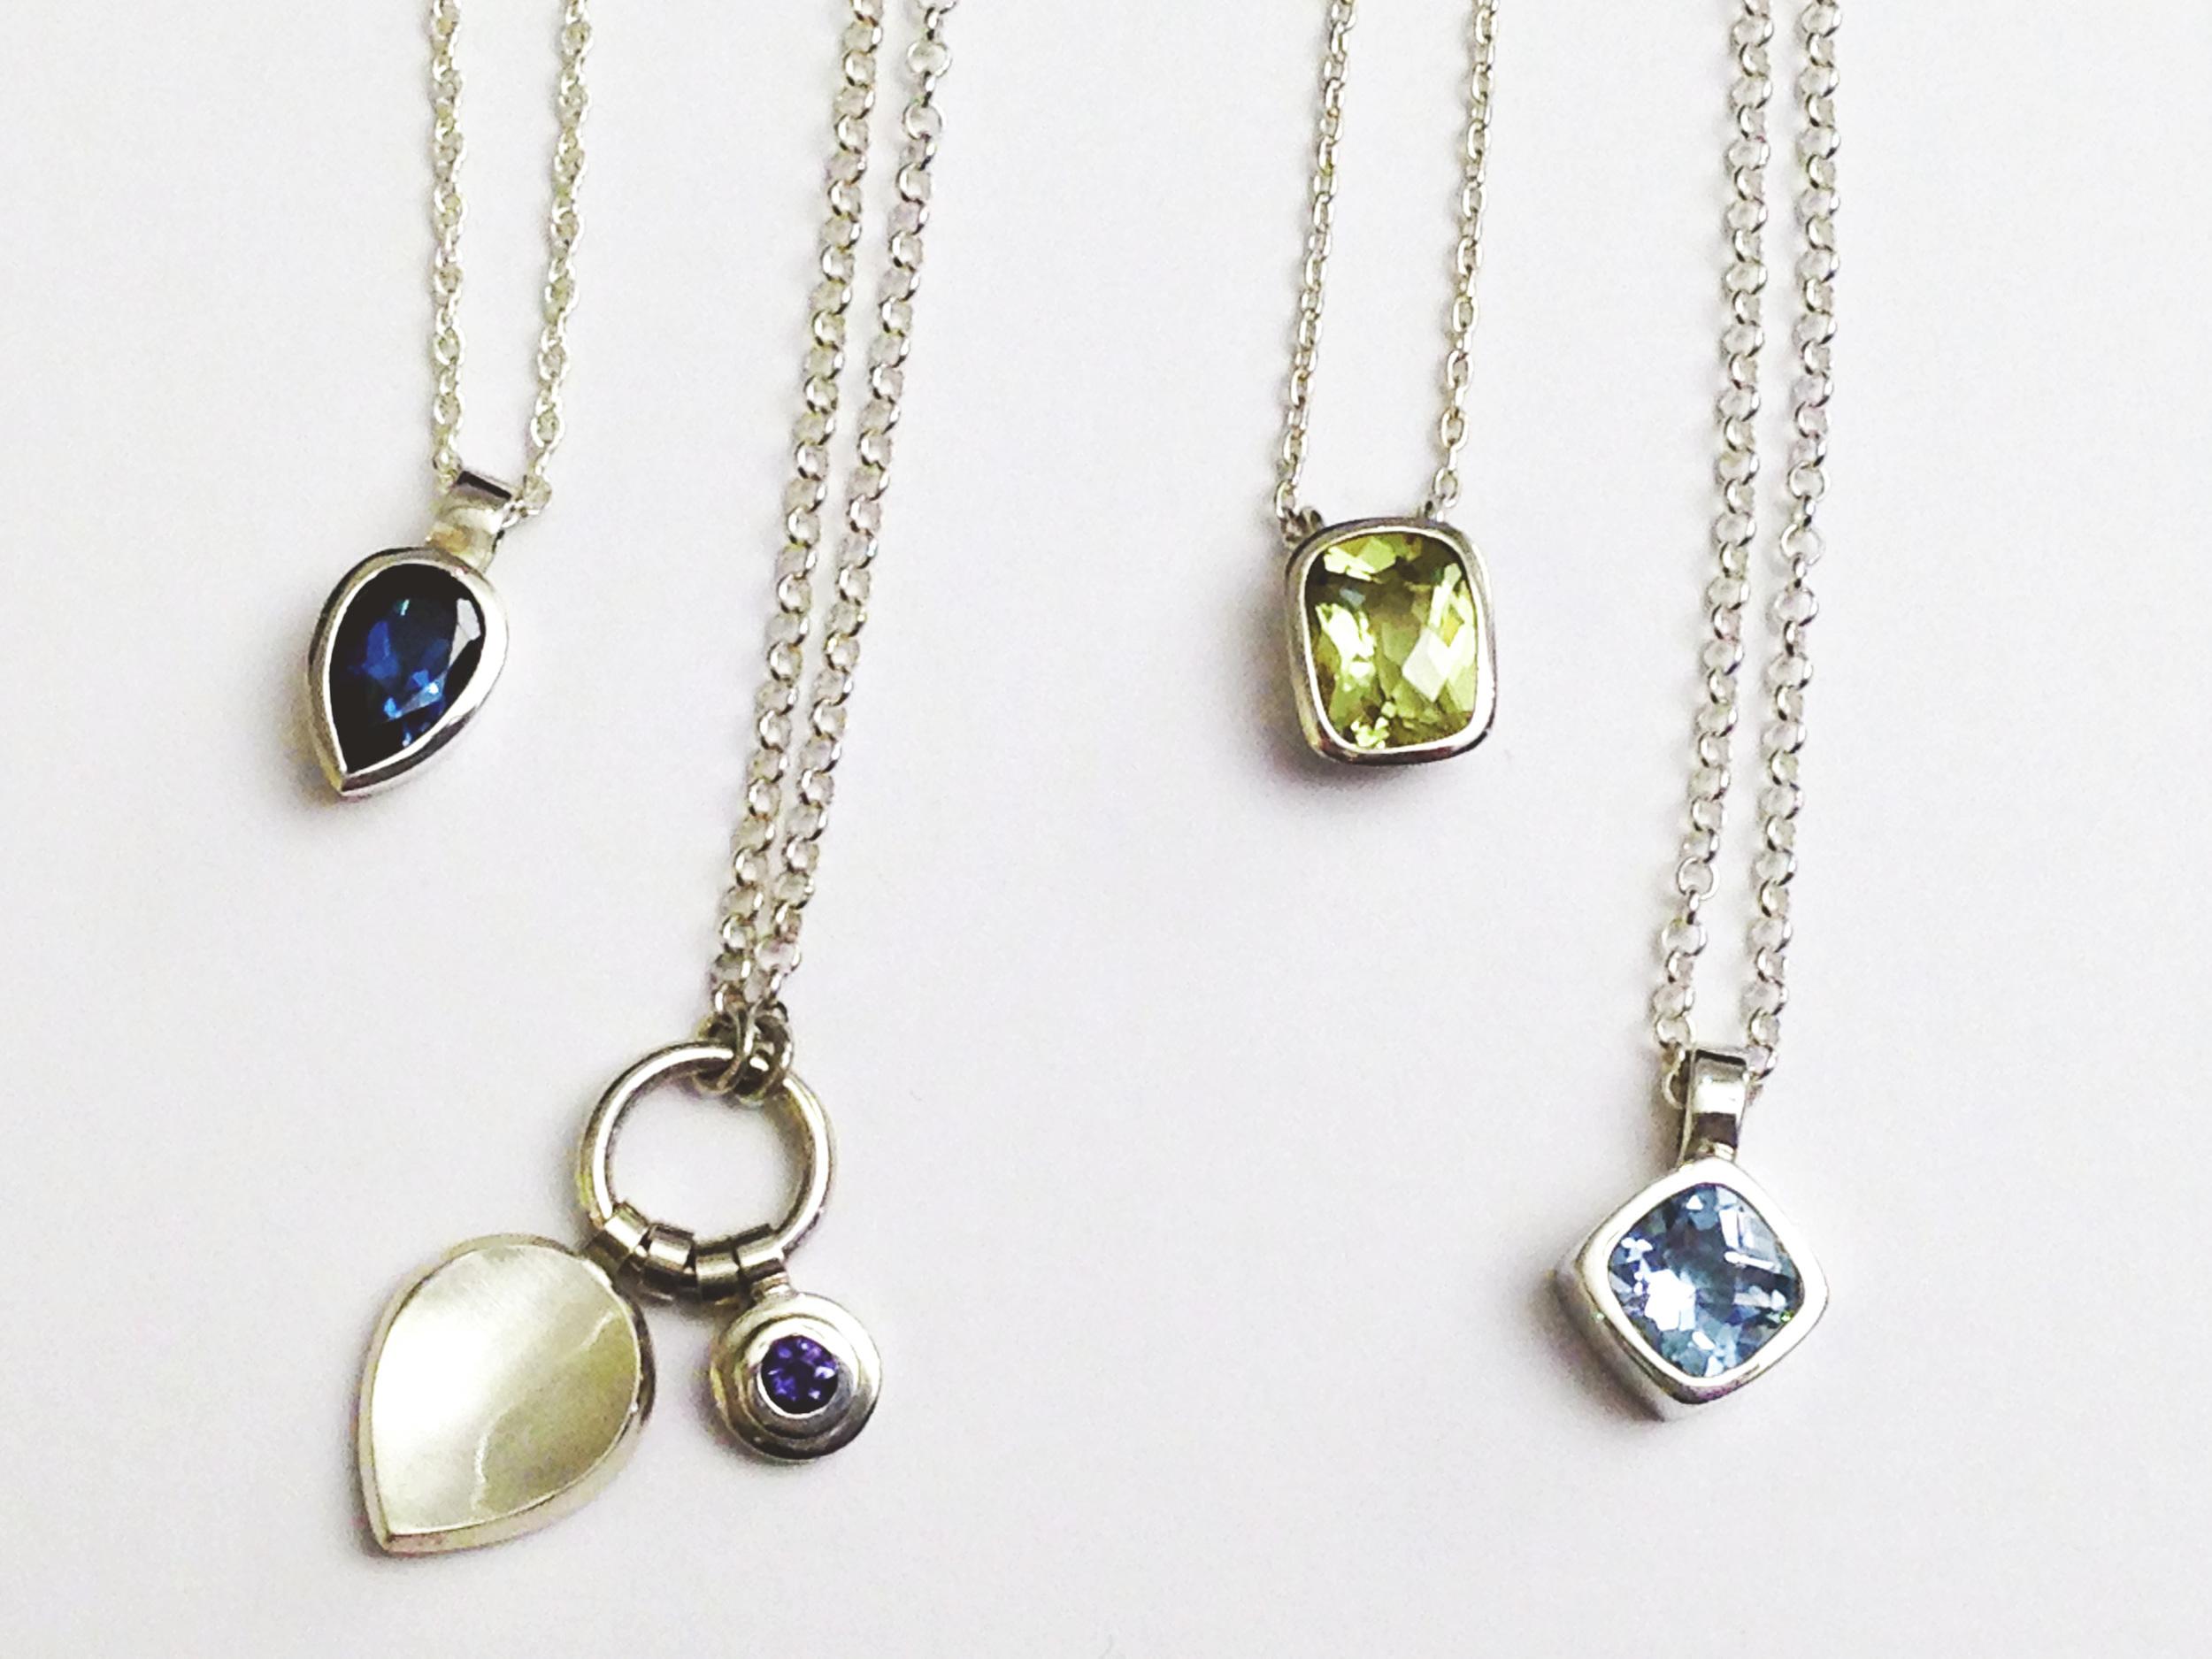 Semi-precious stone necklaces by Andrea Mueller